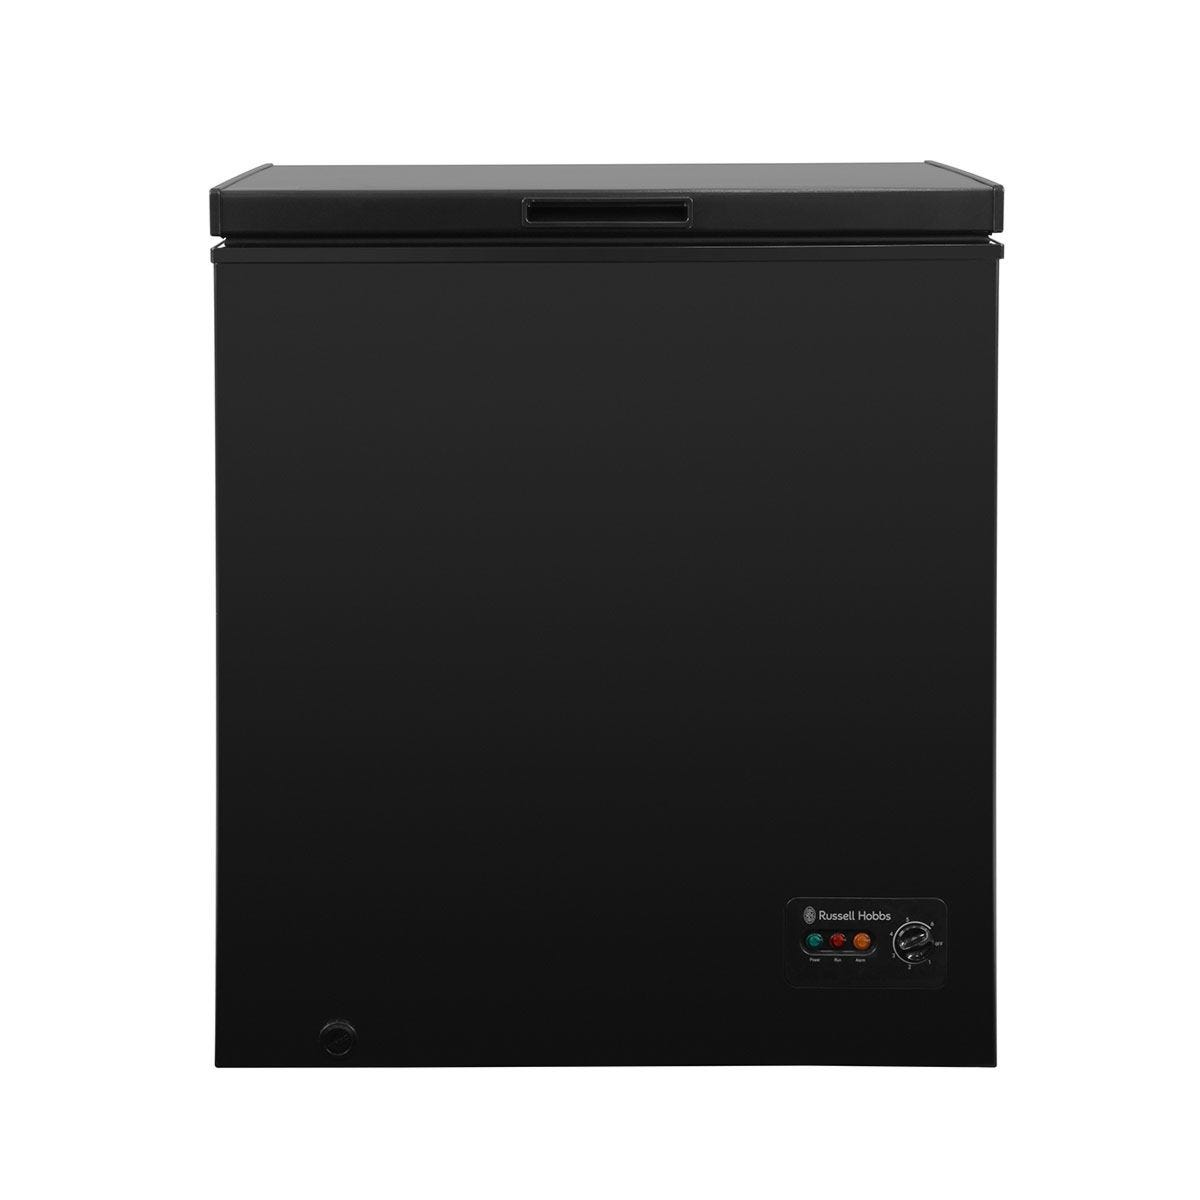 Russell Hobbs RHCF142B 142L Chest Freezer - Black